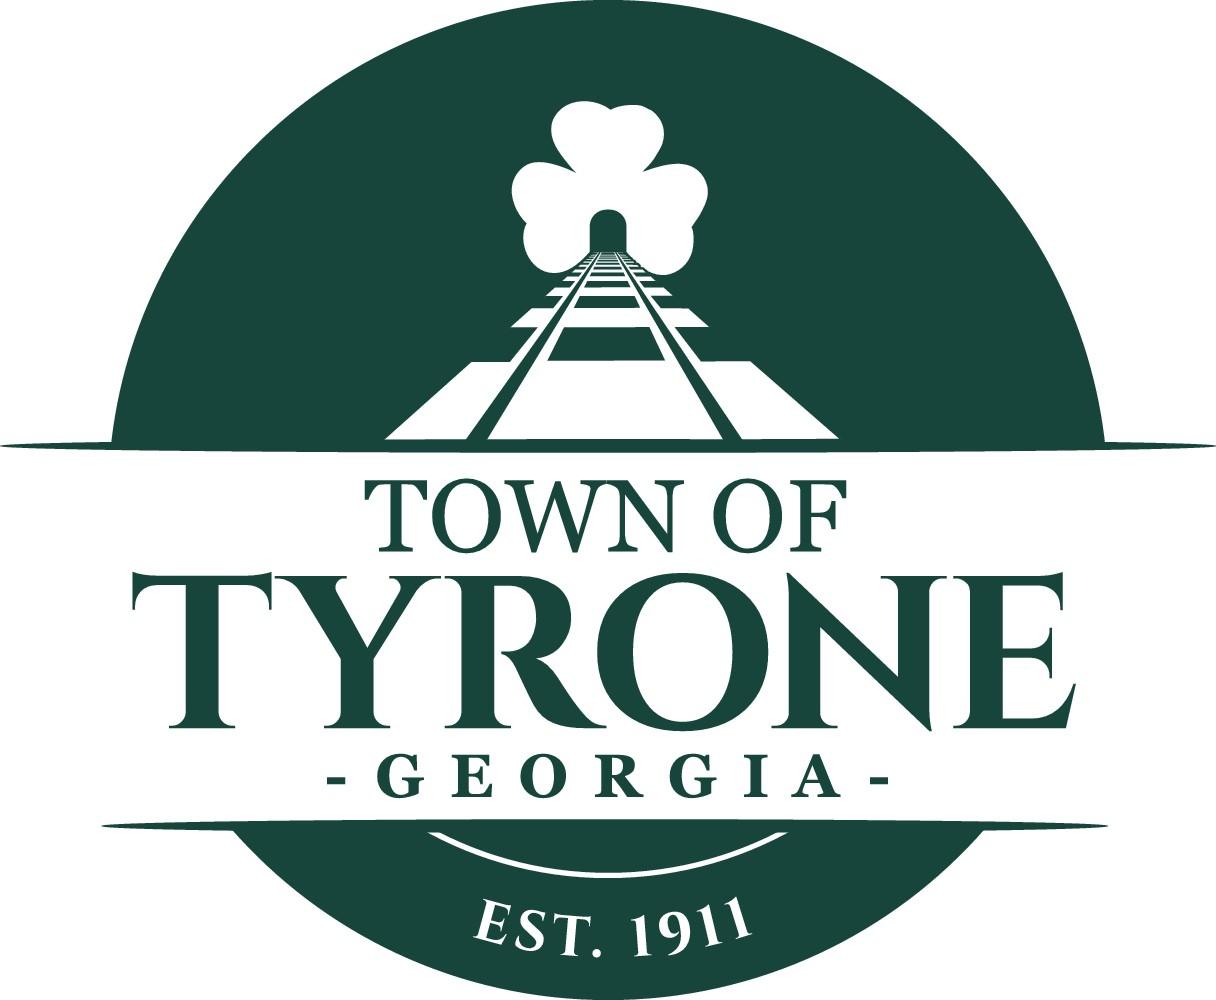 Logo design contest for town with highest income per capita in Georgia